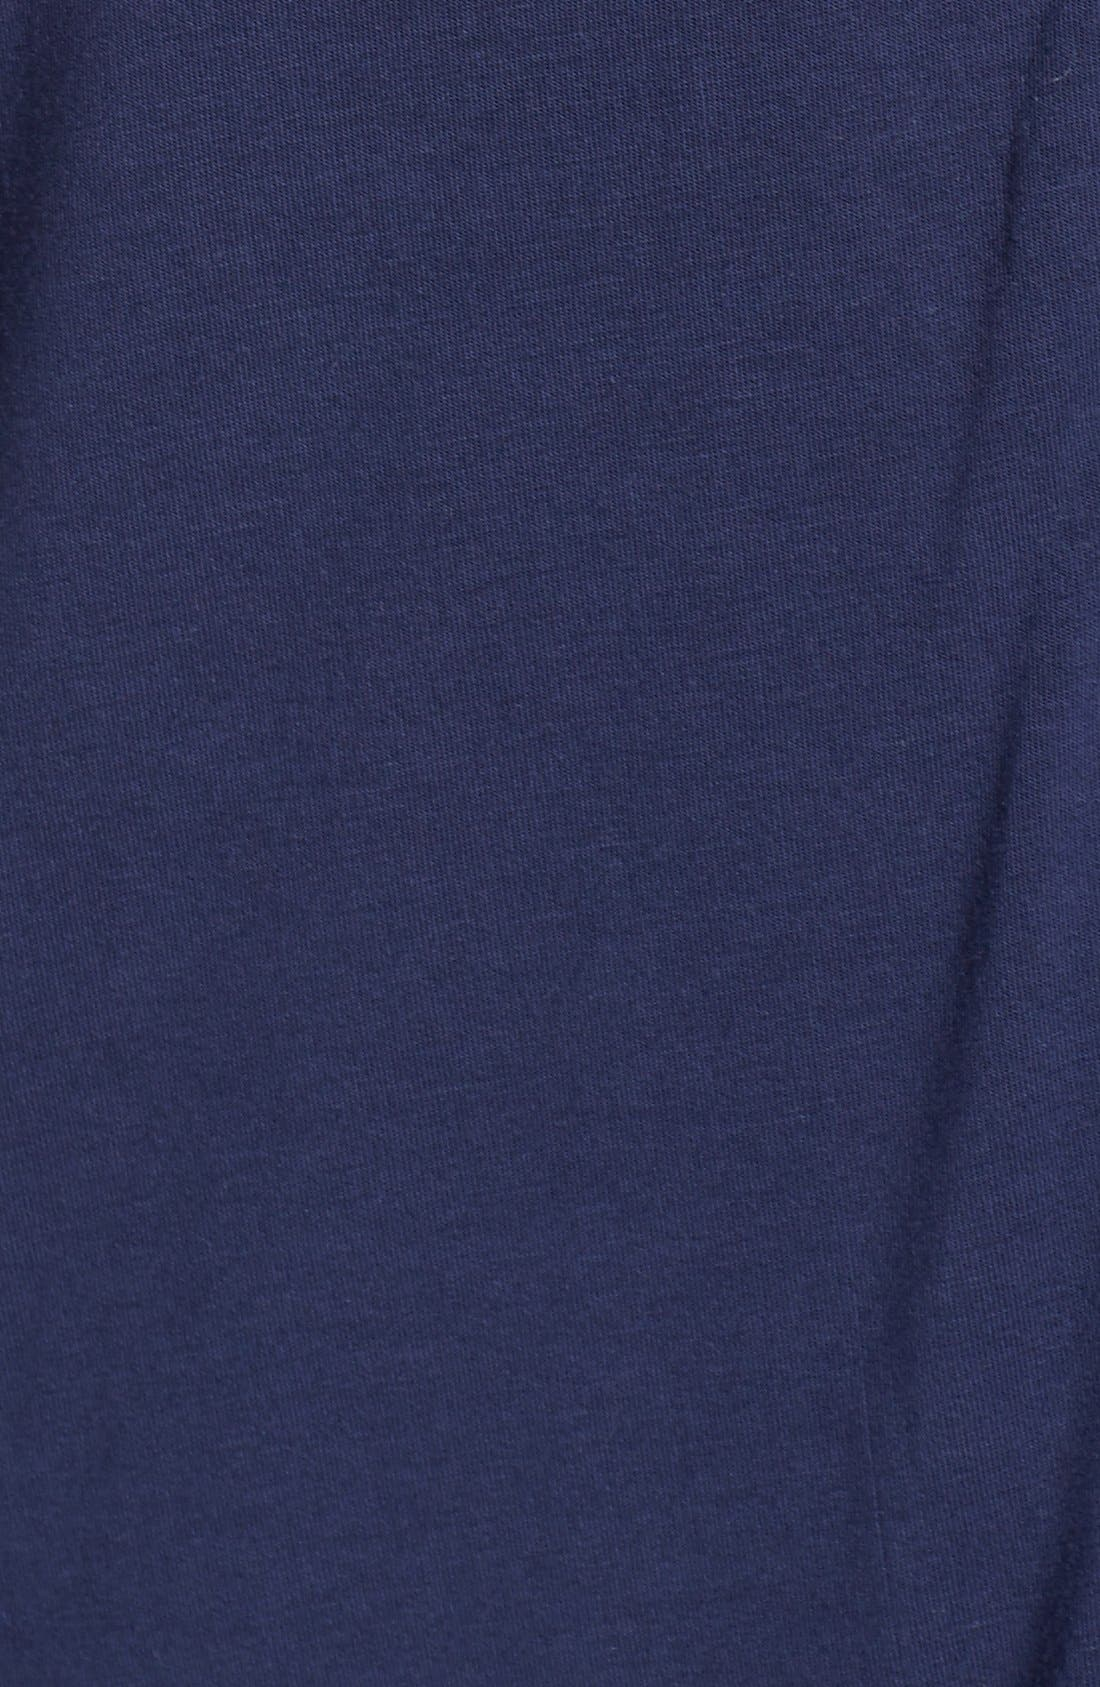 'Moonlight' Pajamas,                             Alternate thumbnail 5, color,                             Navy Peacoat